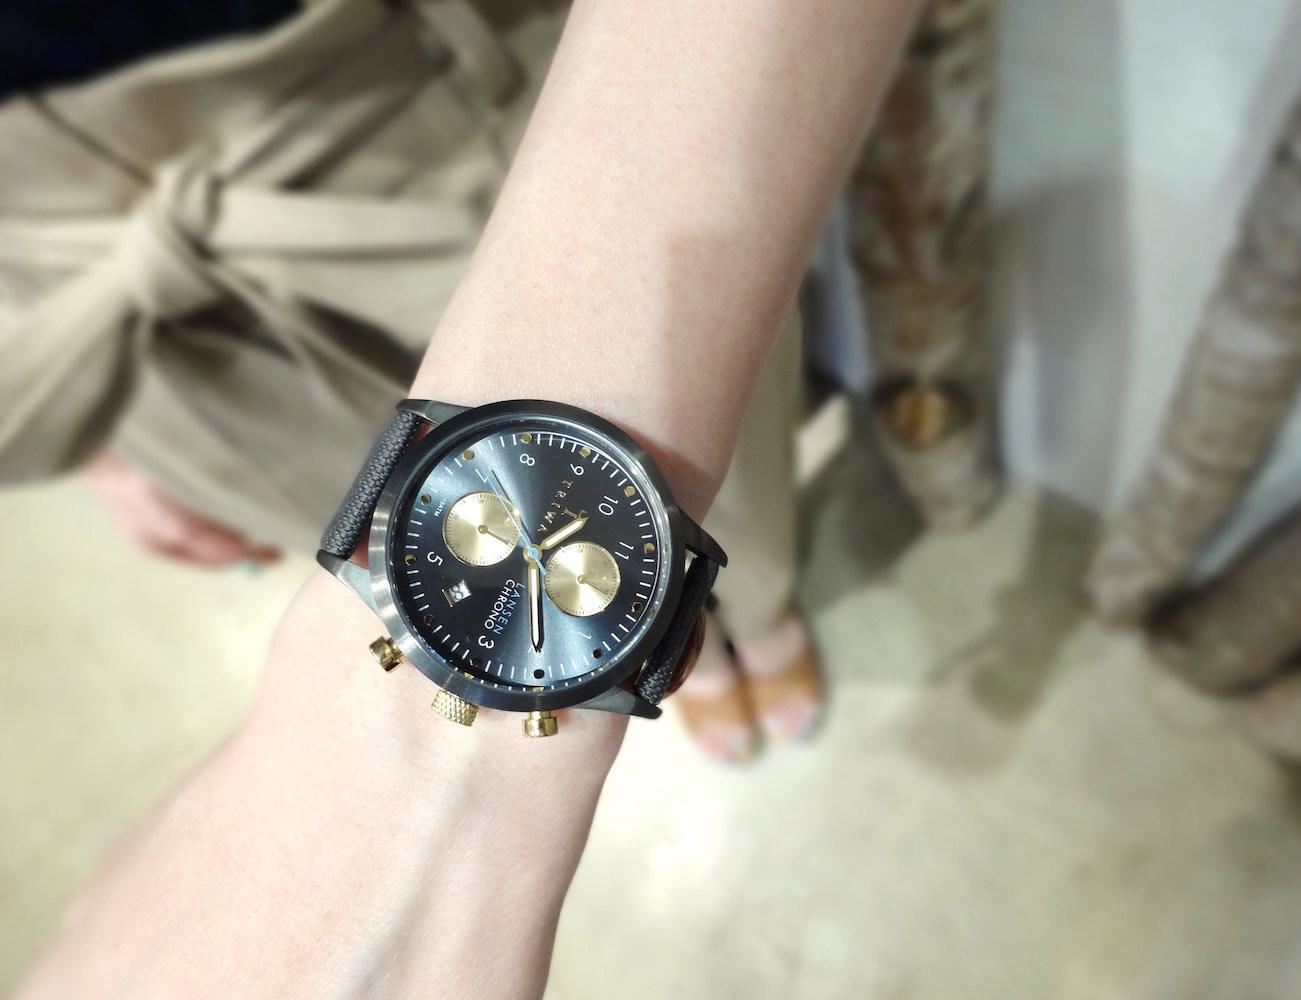 Walter+Lansen+Chrono+Watch+By+Triwa